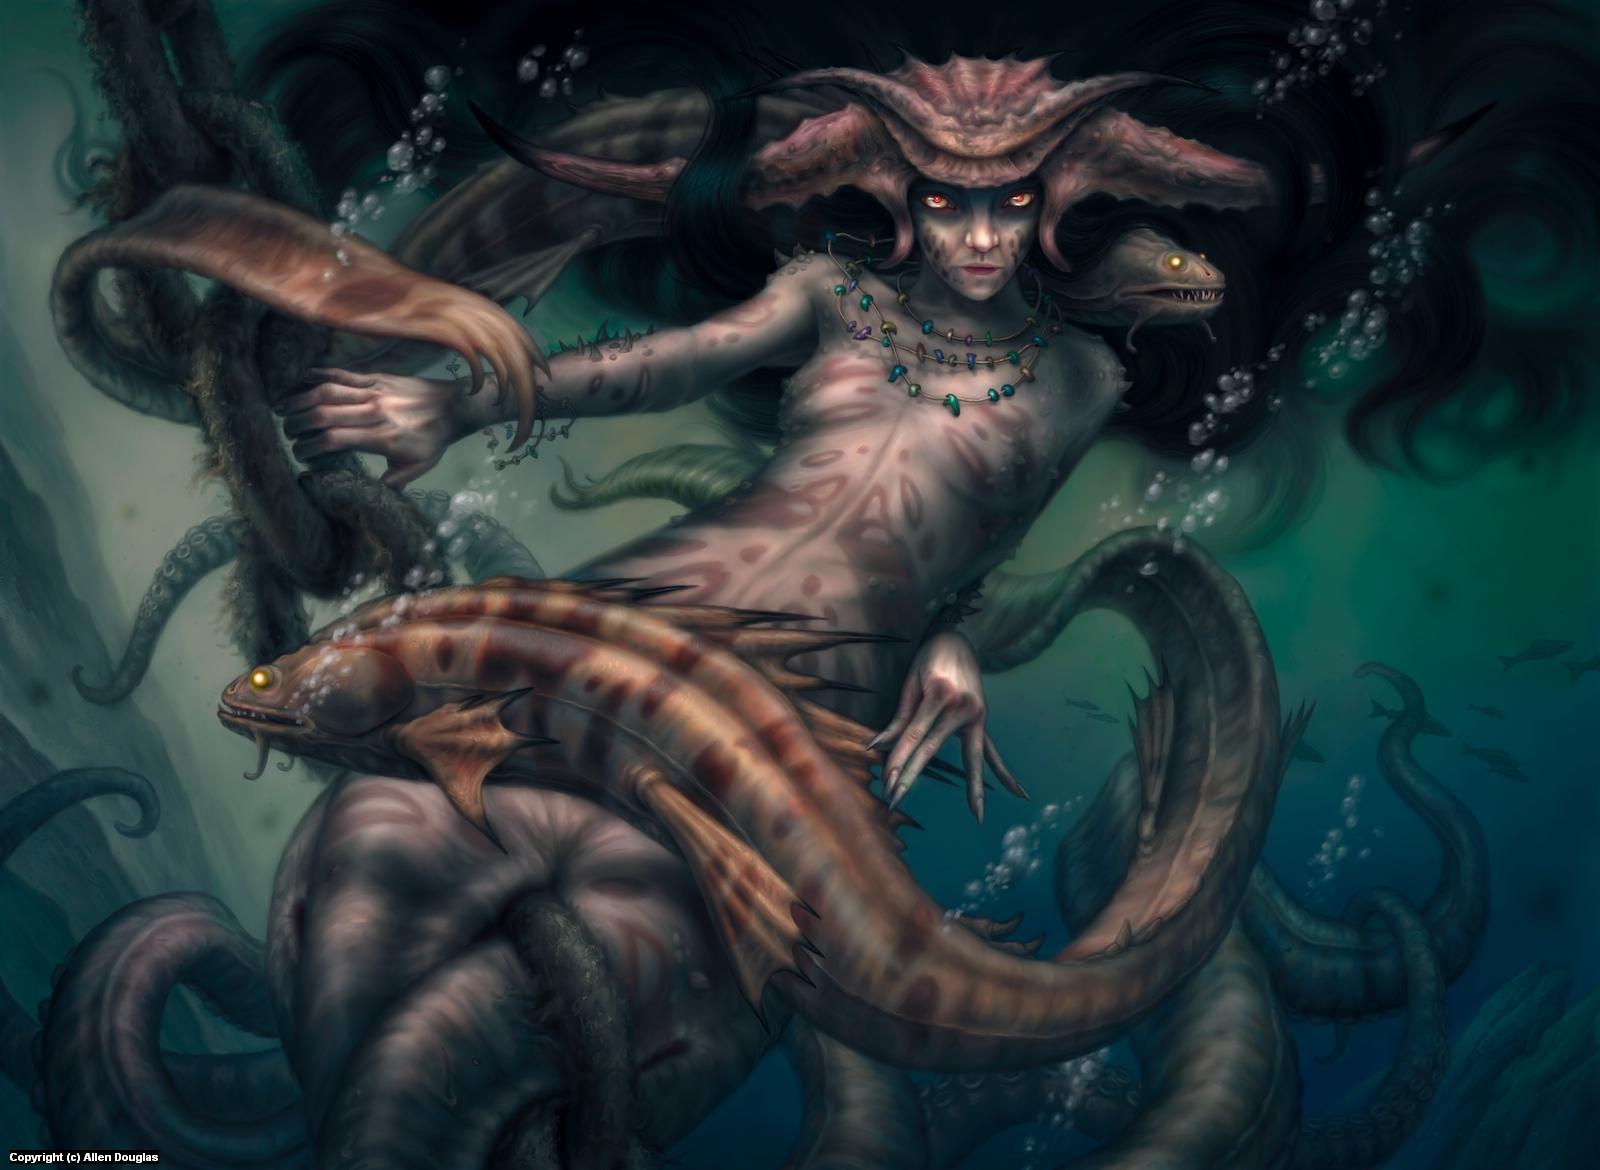 Deep Witch Artwork by Allen Douglas